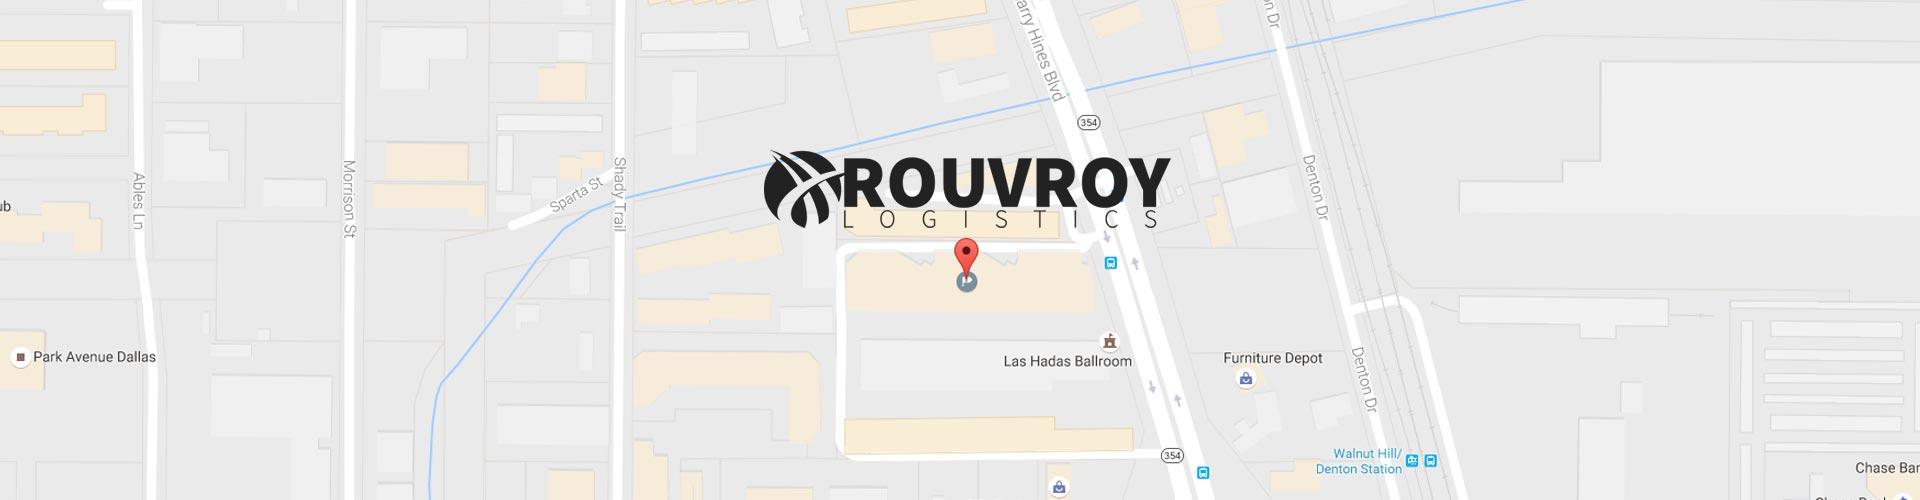 Rouvroy Logistics Map